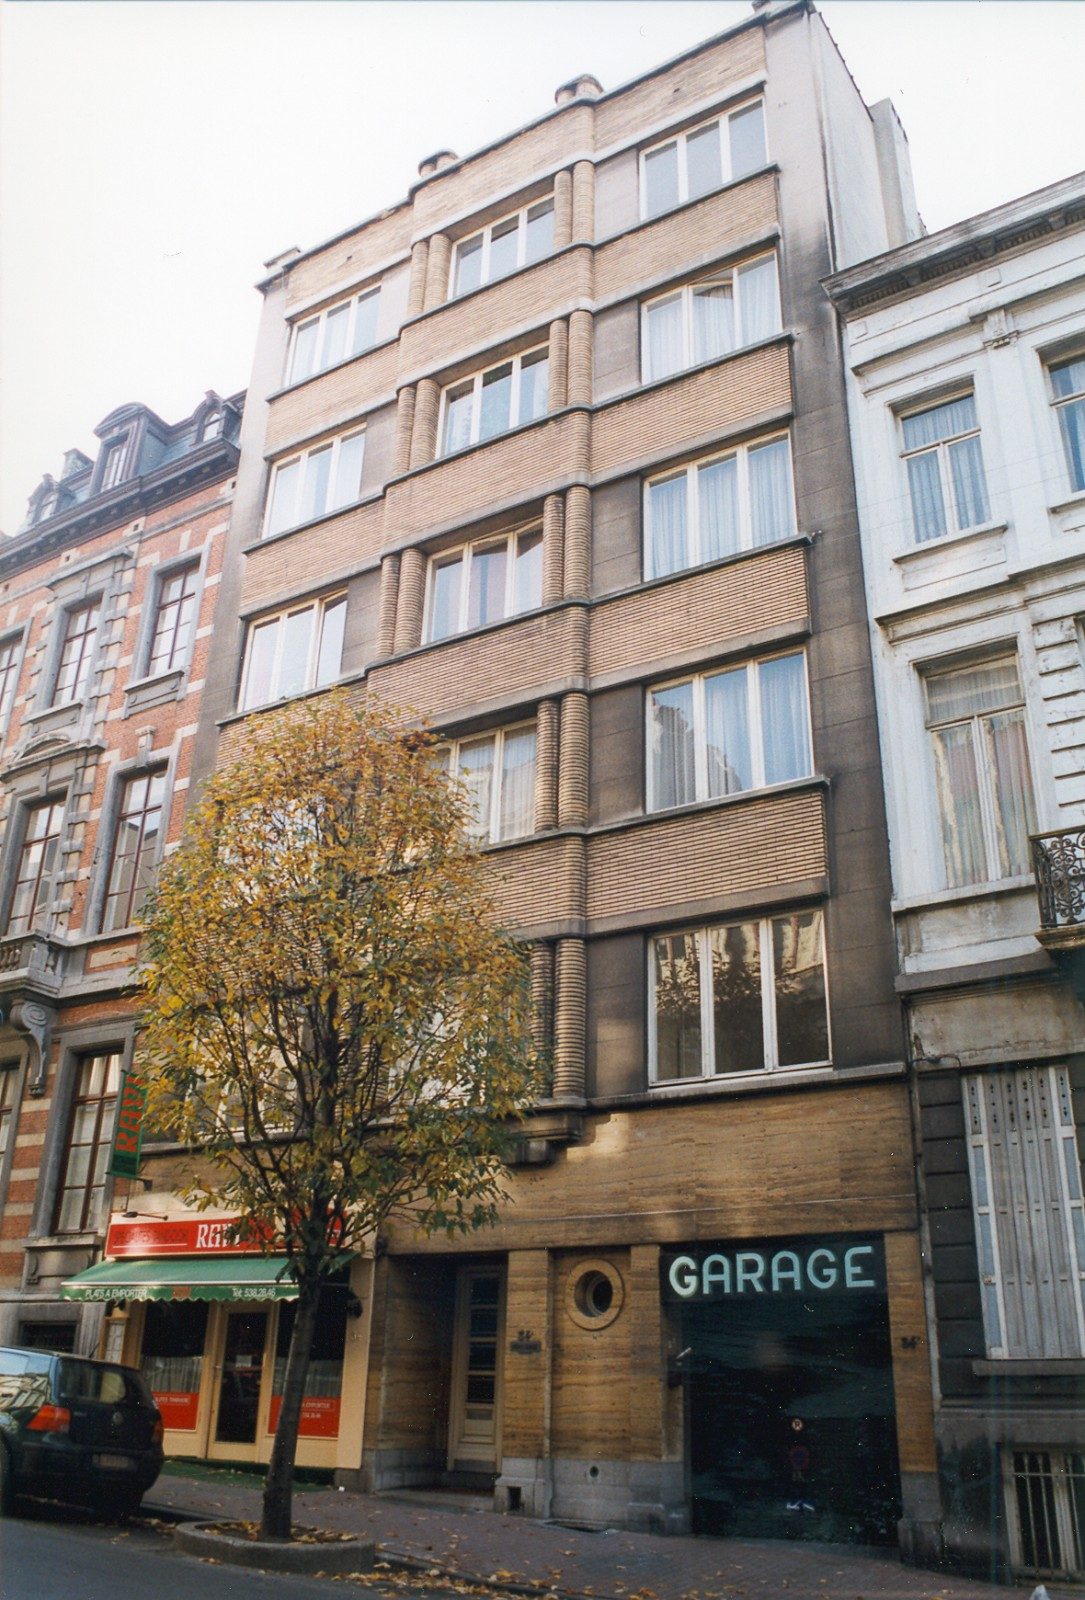 Berckmansstraat 34-34a-34b., 1999